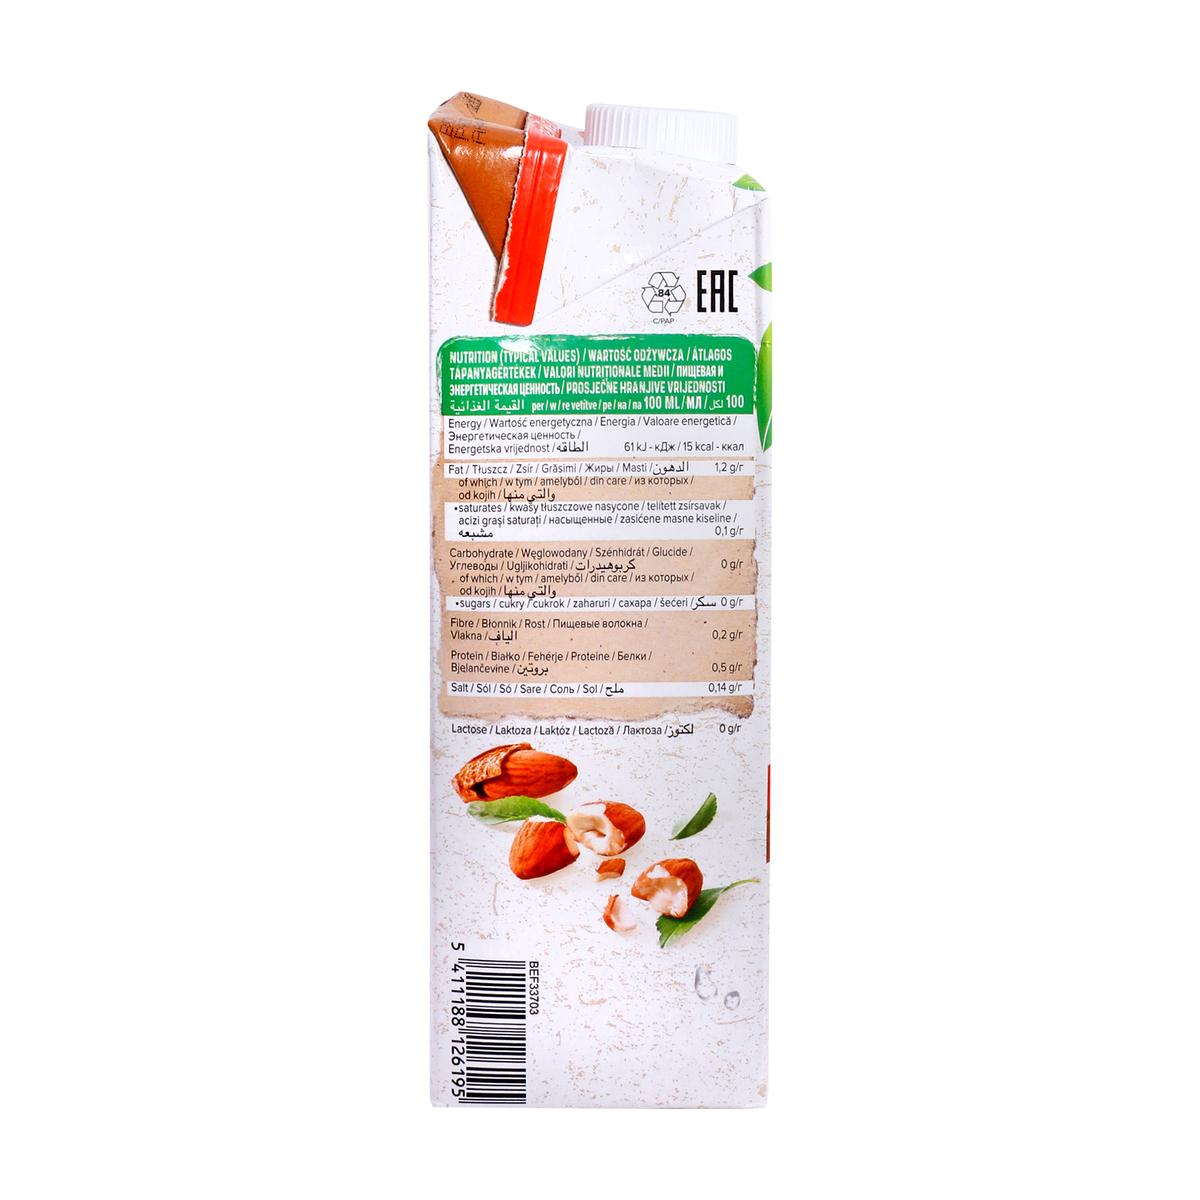 Alpro Organic Bio Almond Drink Unsweetened 1Litre 02